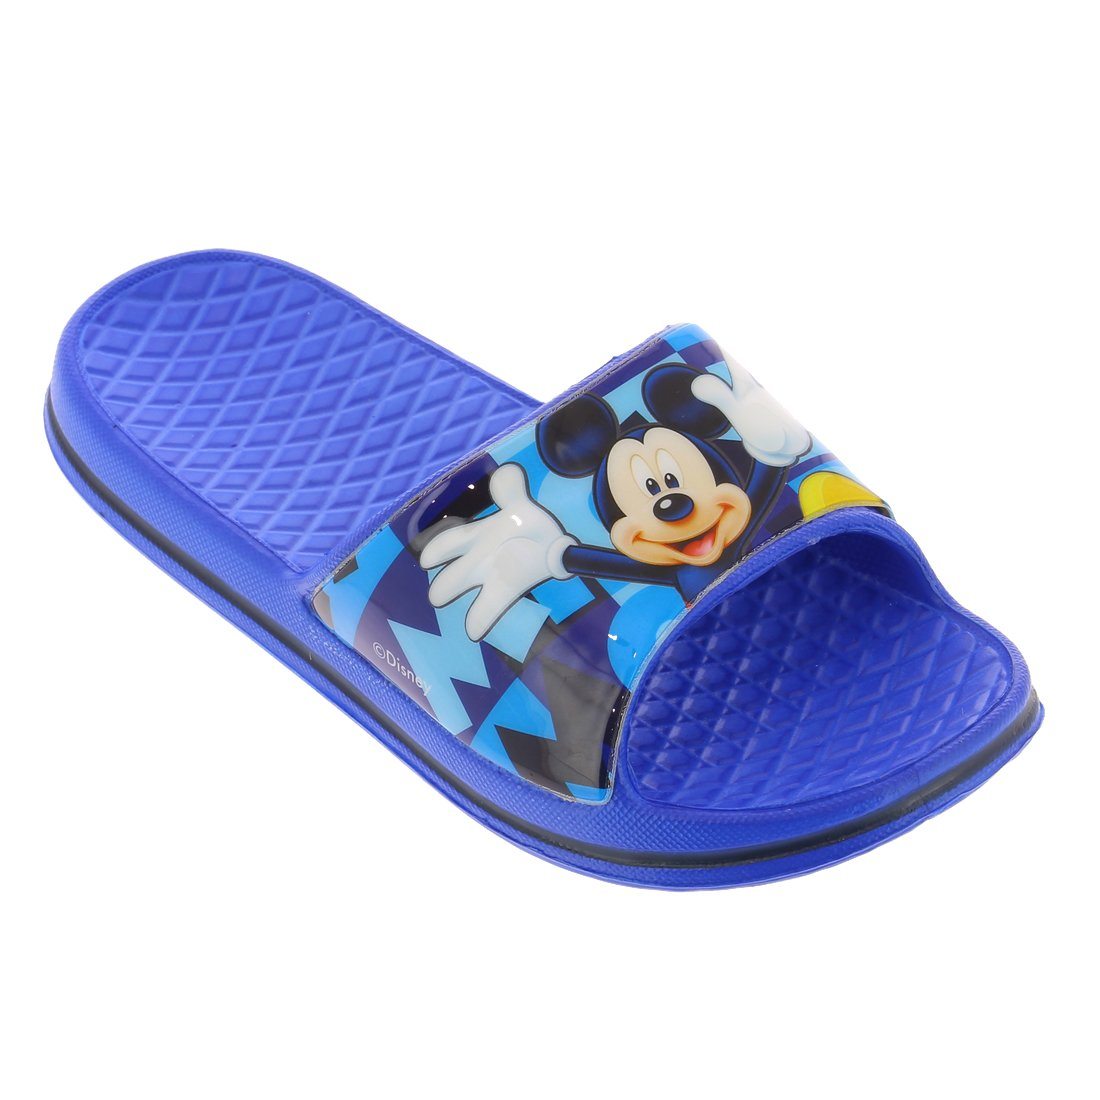 Mickey - Sandales de Piscine Mickey